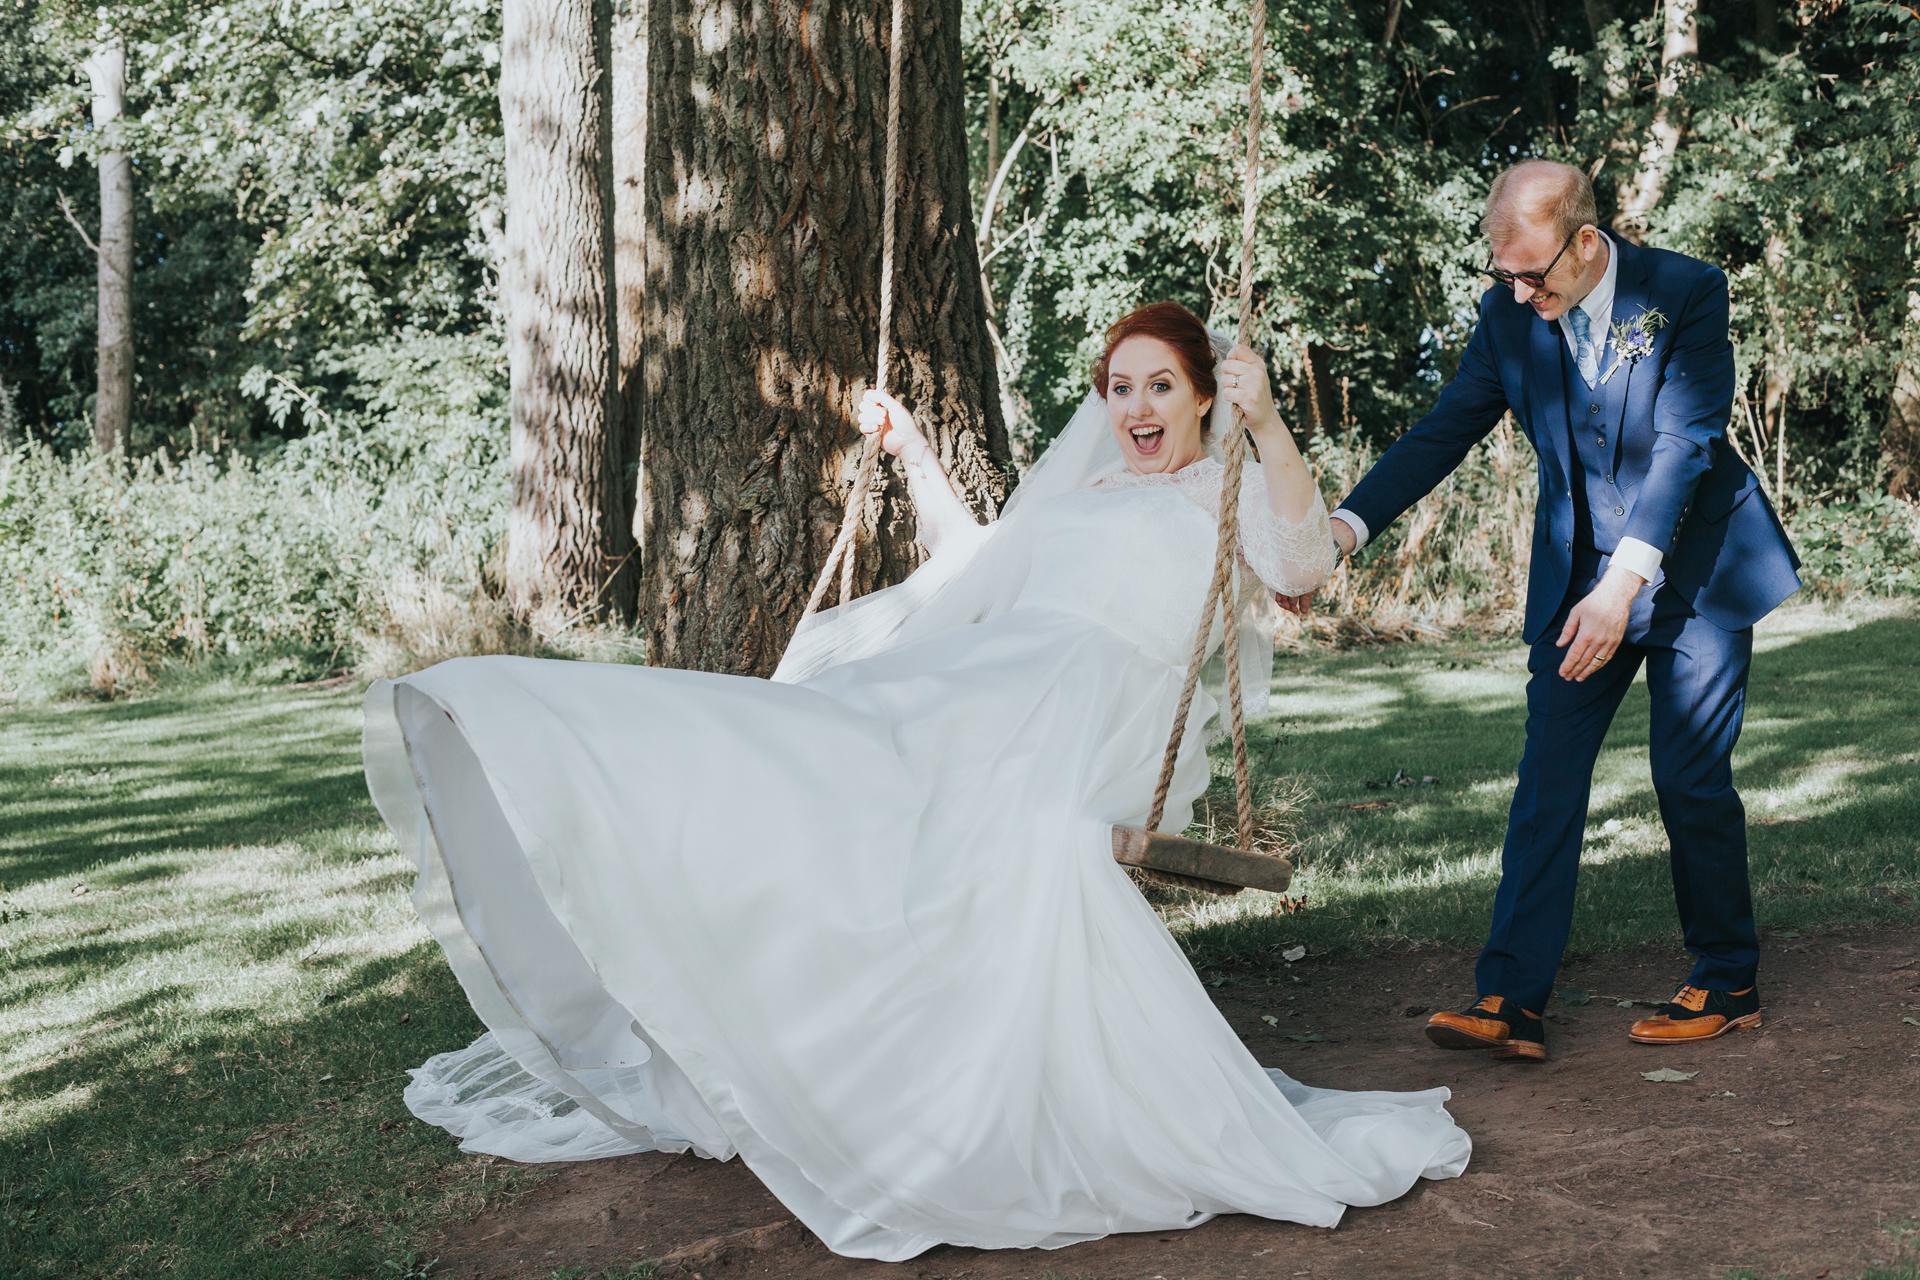 Bride and groom playing on swings.